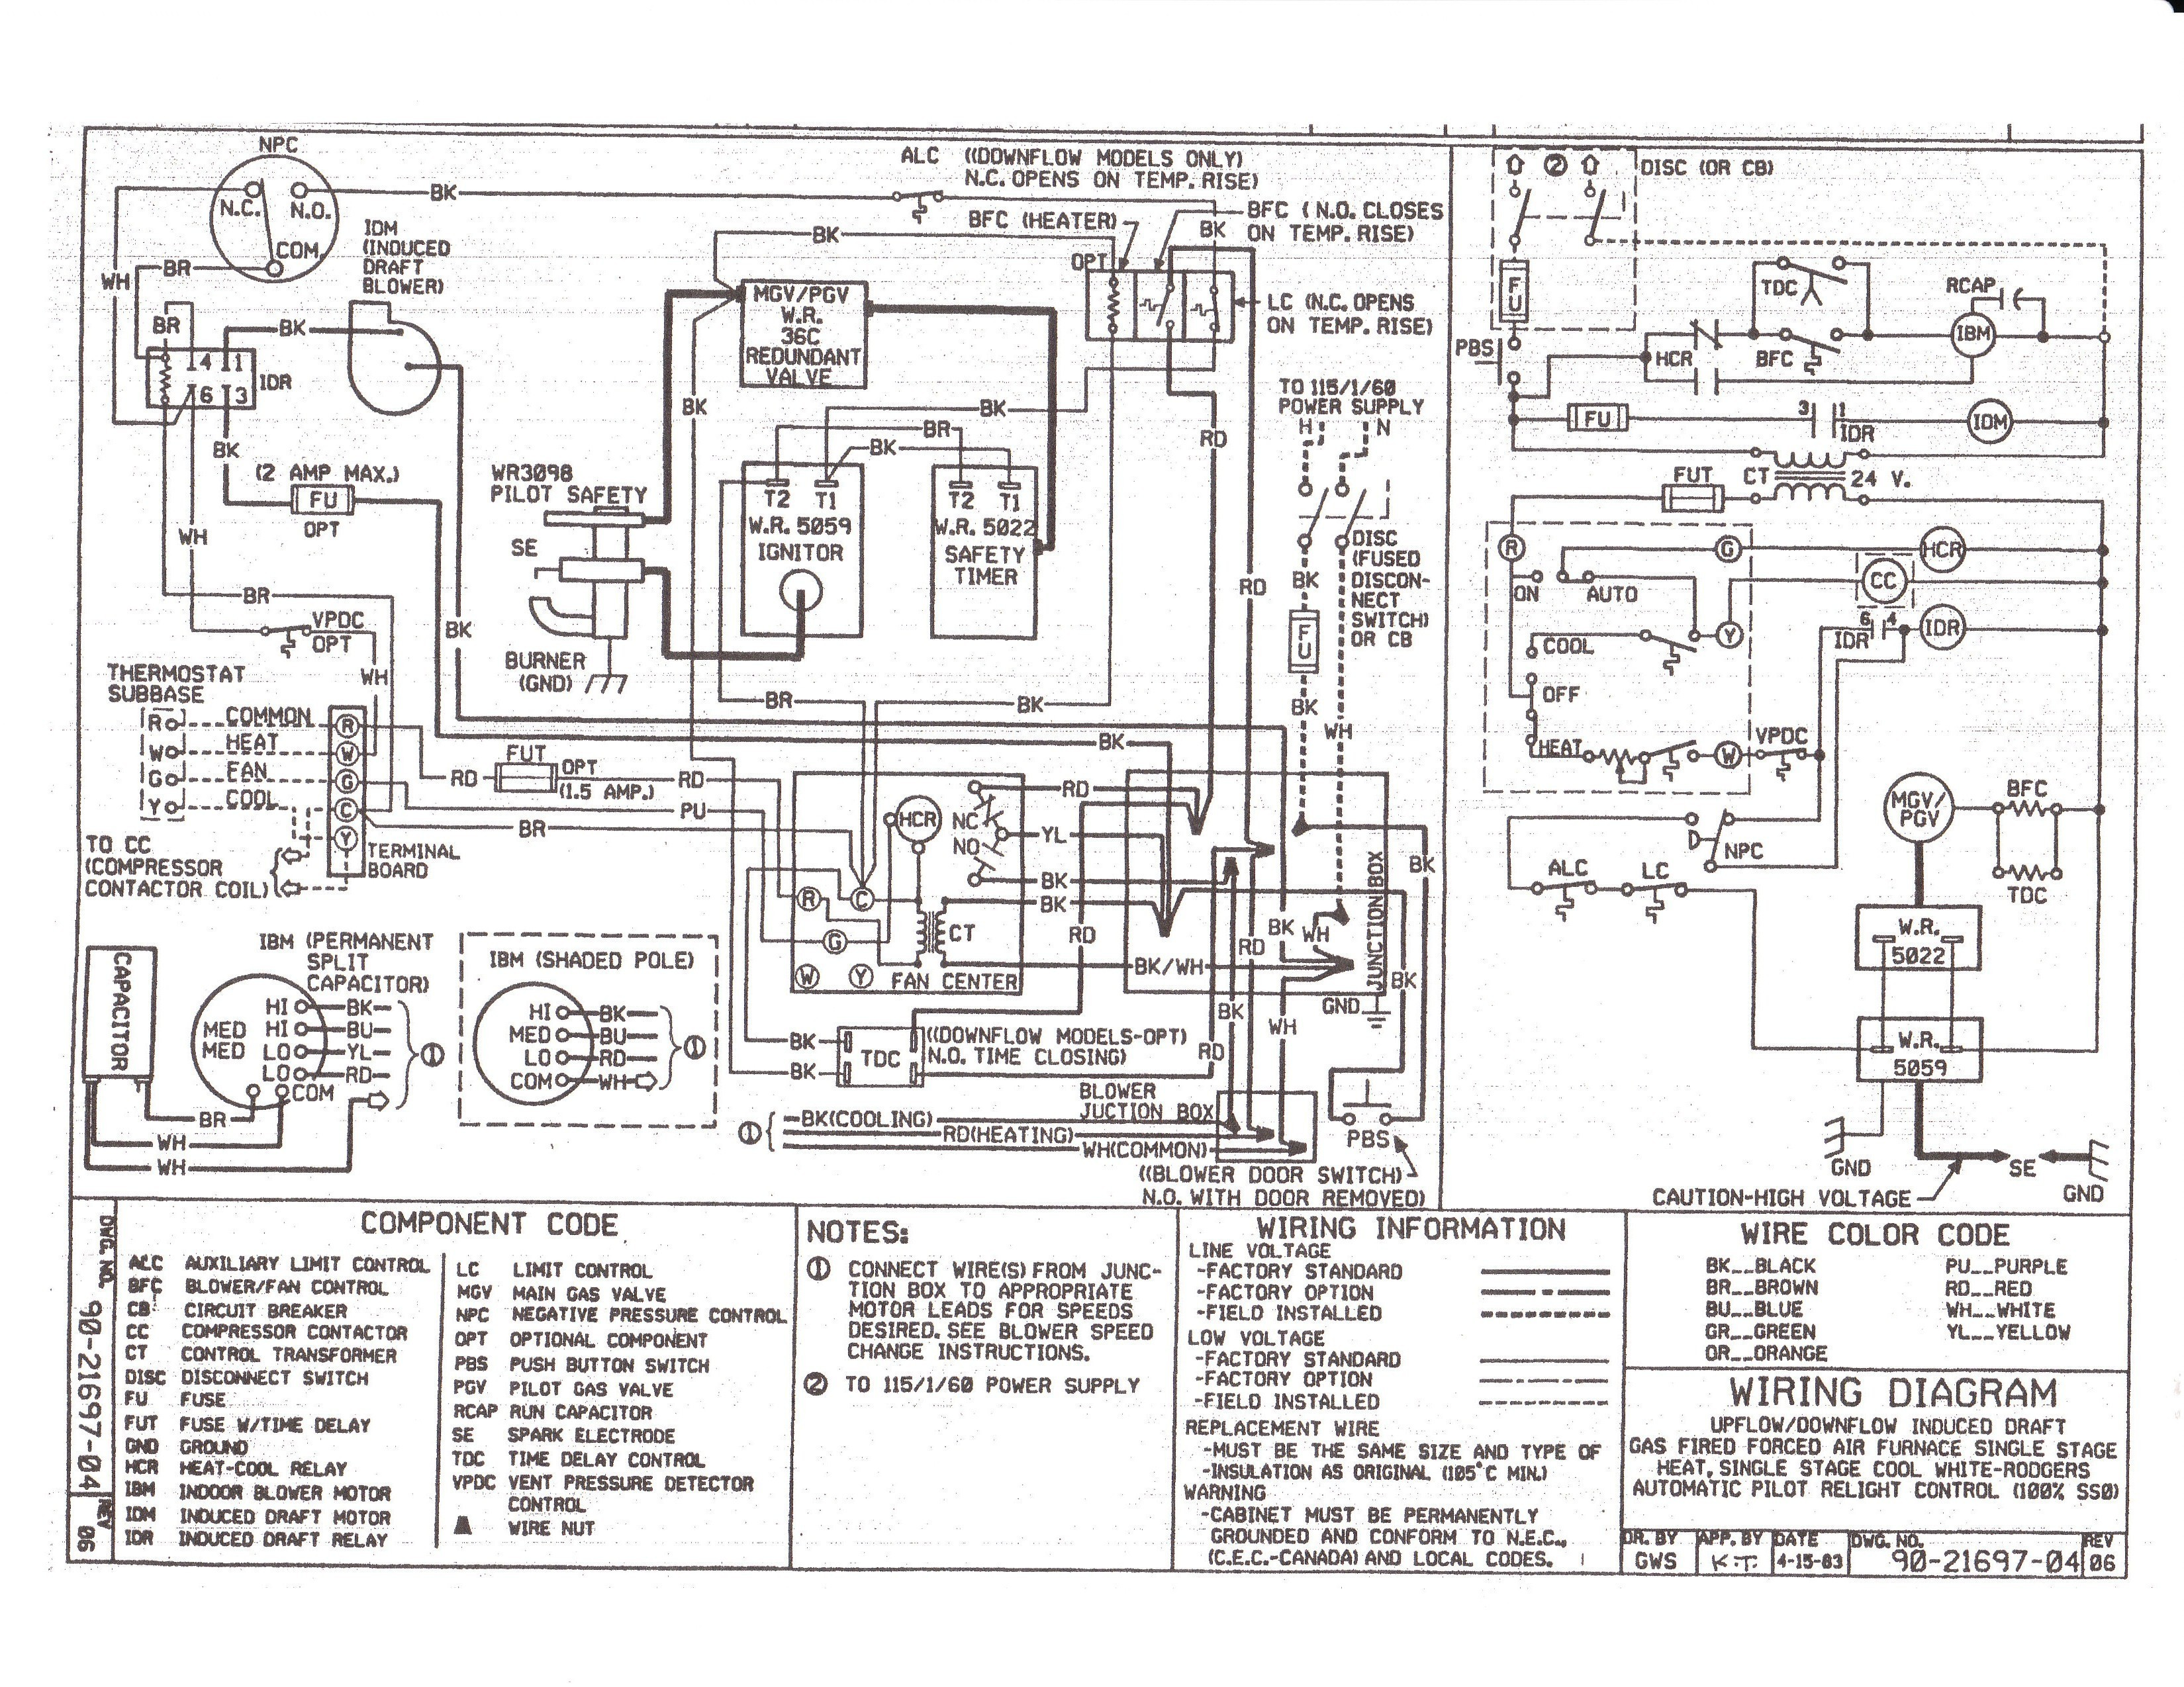 Friedrich Gas Furnace Wiring - Wiring Diagram G11 on old furnace wiring diagram, gas water heater schematic, dayton gas heater schematic, furnace controller schematic, gas pool schematic, old martin gas heaters, old honeywell thermostat wiring diagram, old gas wall heater,